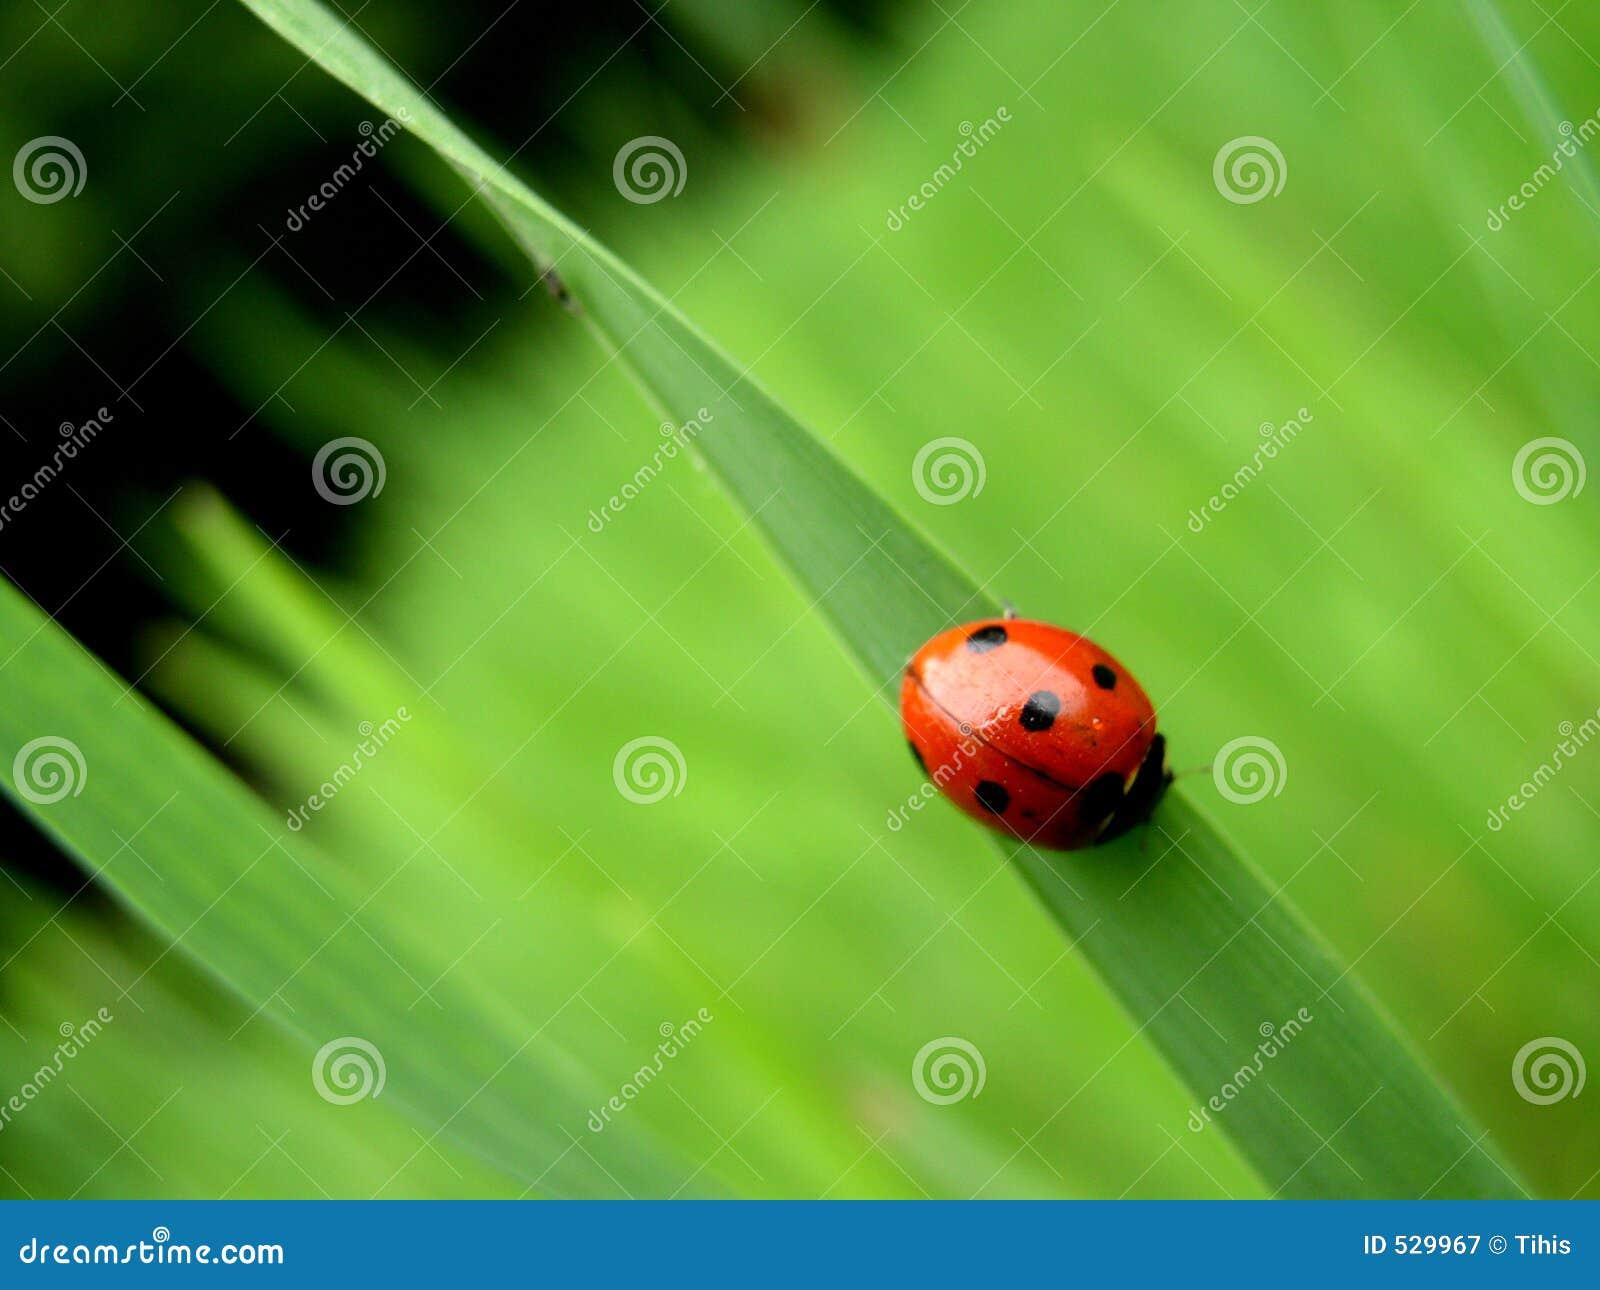 Download 瓢虫 库存图片. 图片 包括有 bringer, 绿色, 瓢虫, 本质, 食物, 运气, 人力, 春天, 乐趣 - 529967